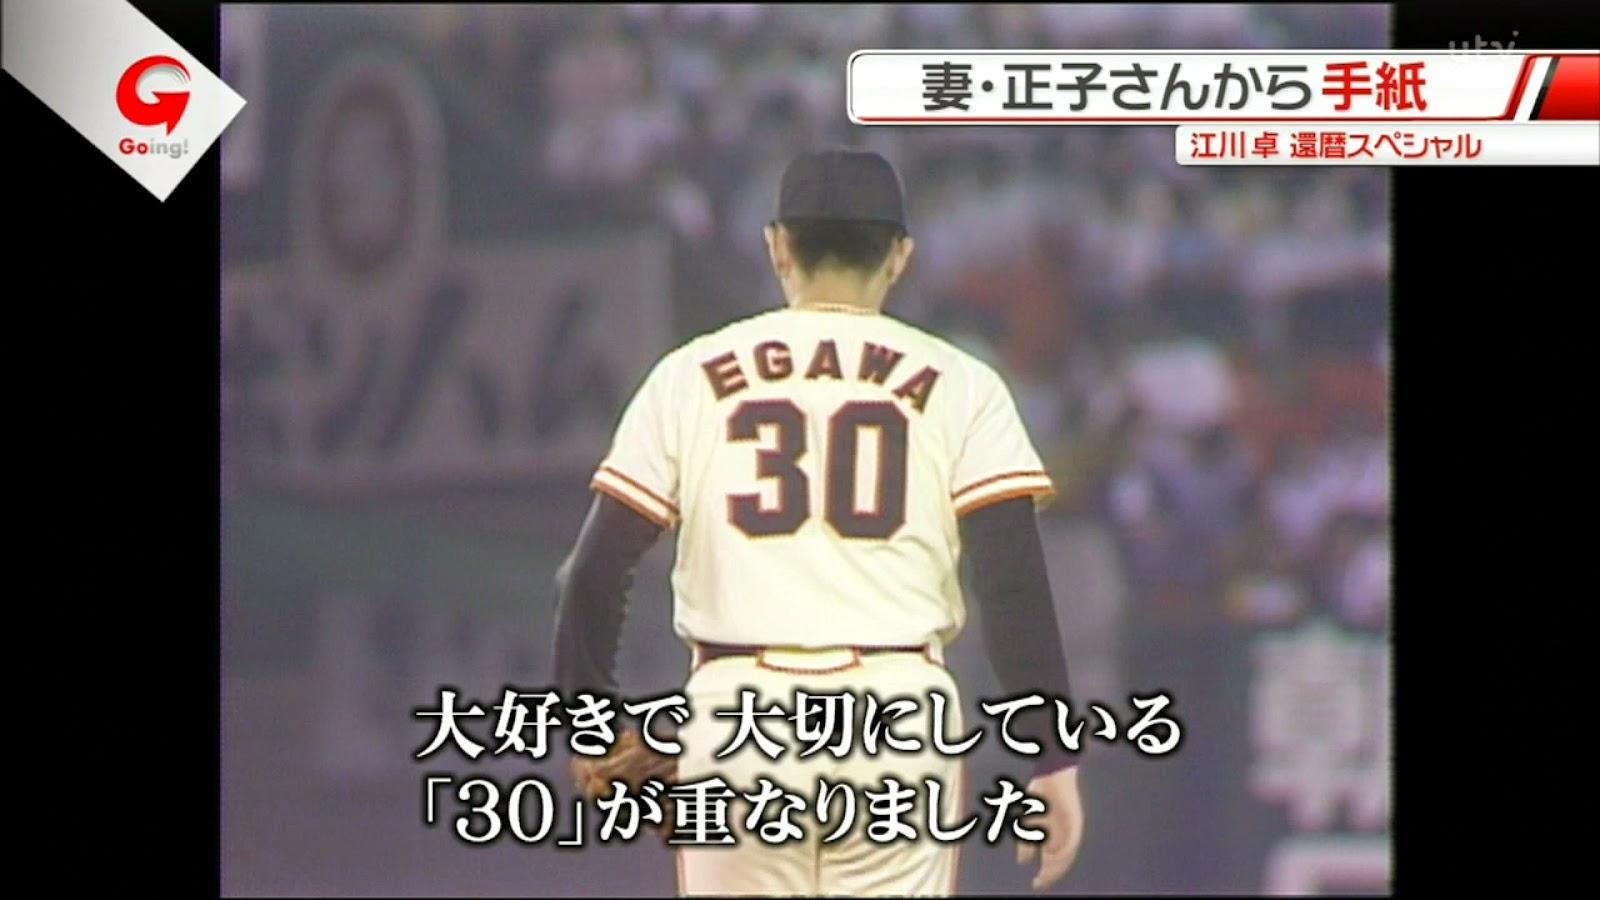 江川卓 (野球)の画像 p1_28